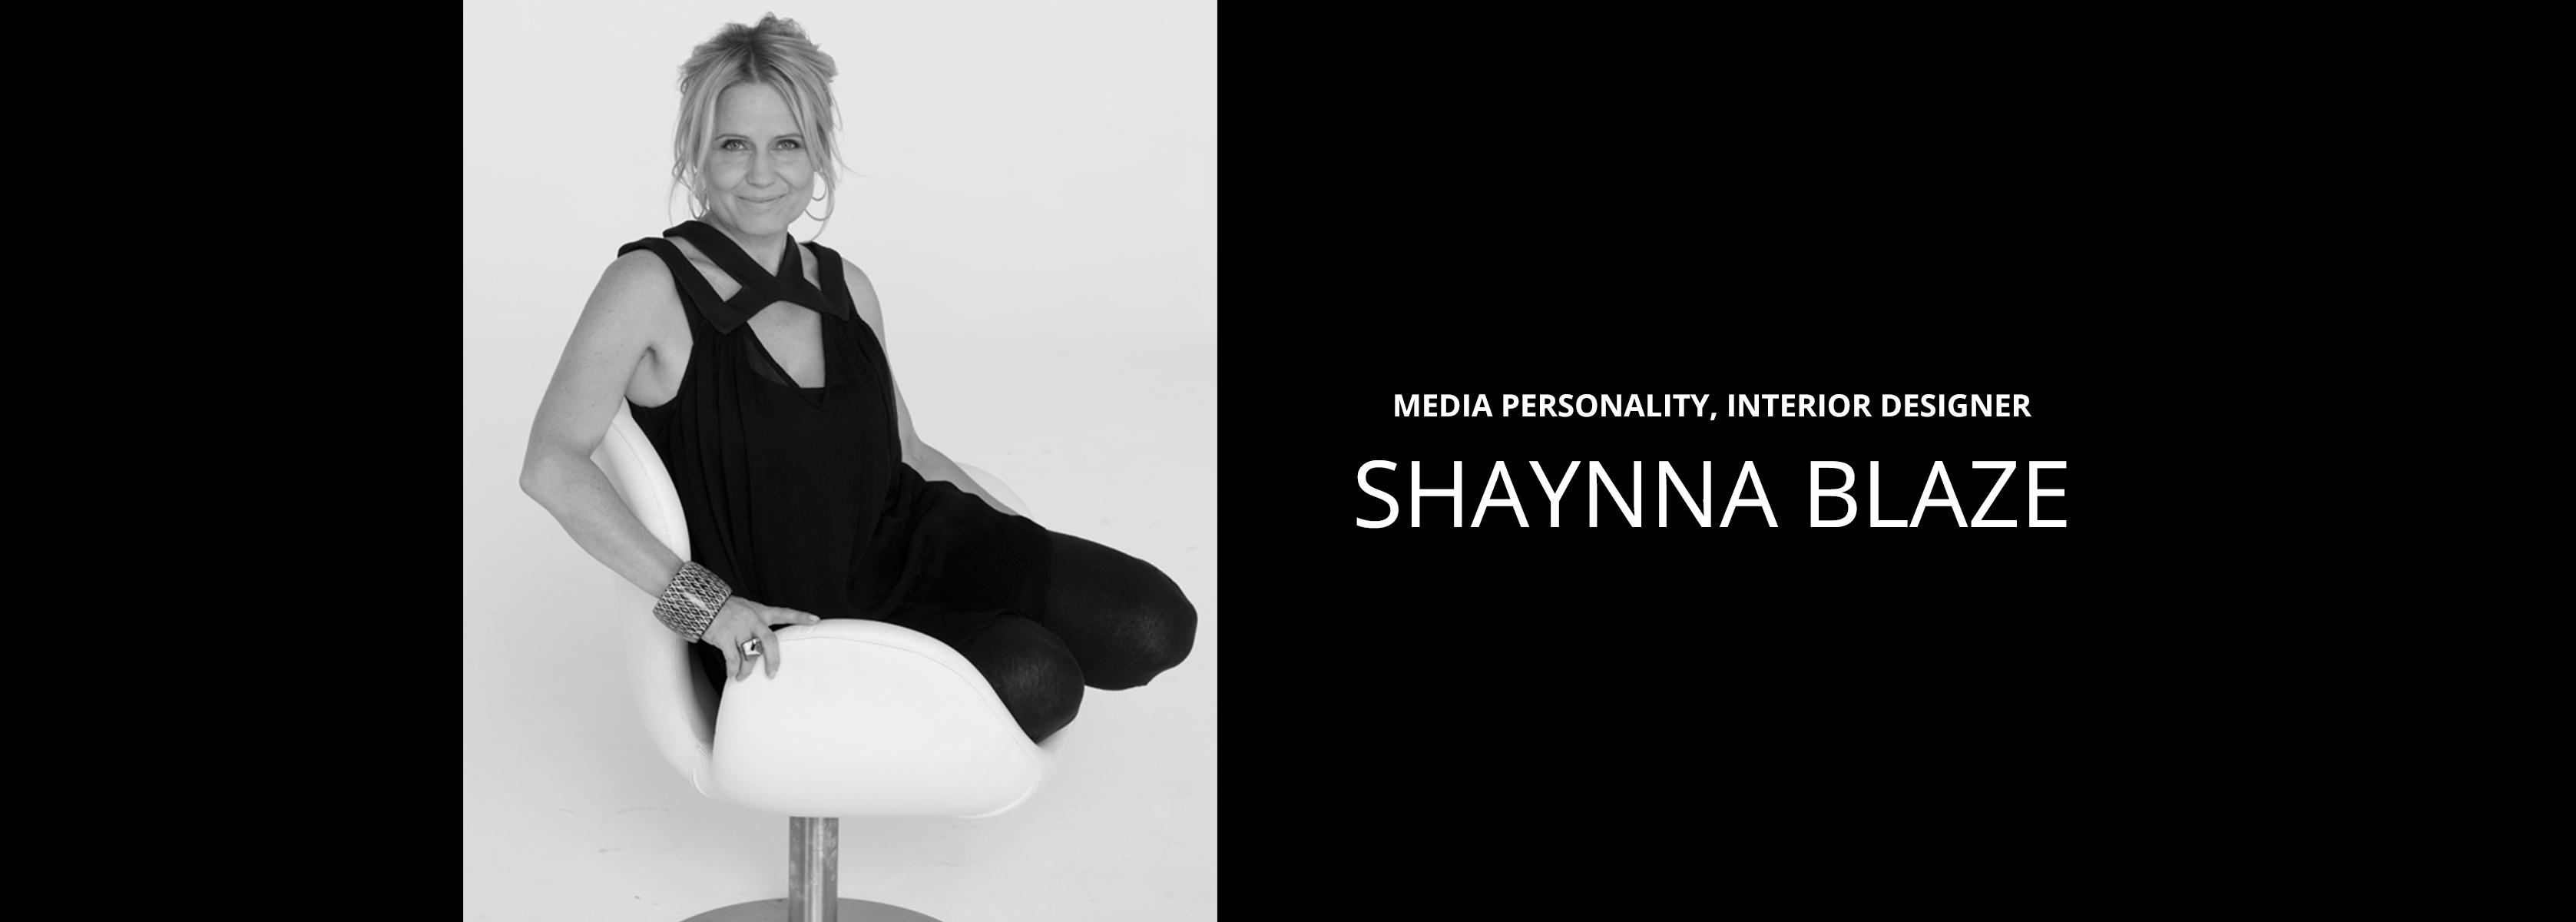 Shaynna Blaze - Media Personality, Interior Designer - Bravo Talent Management